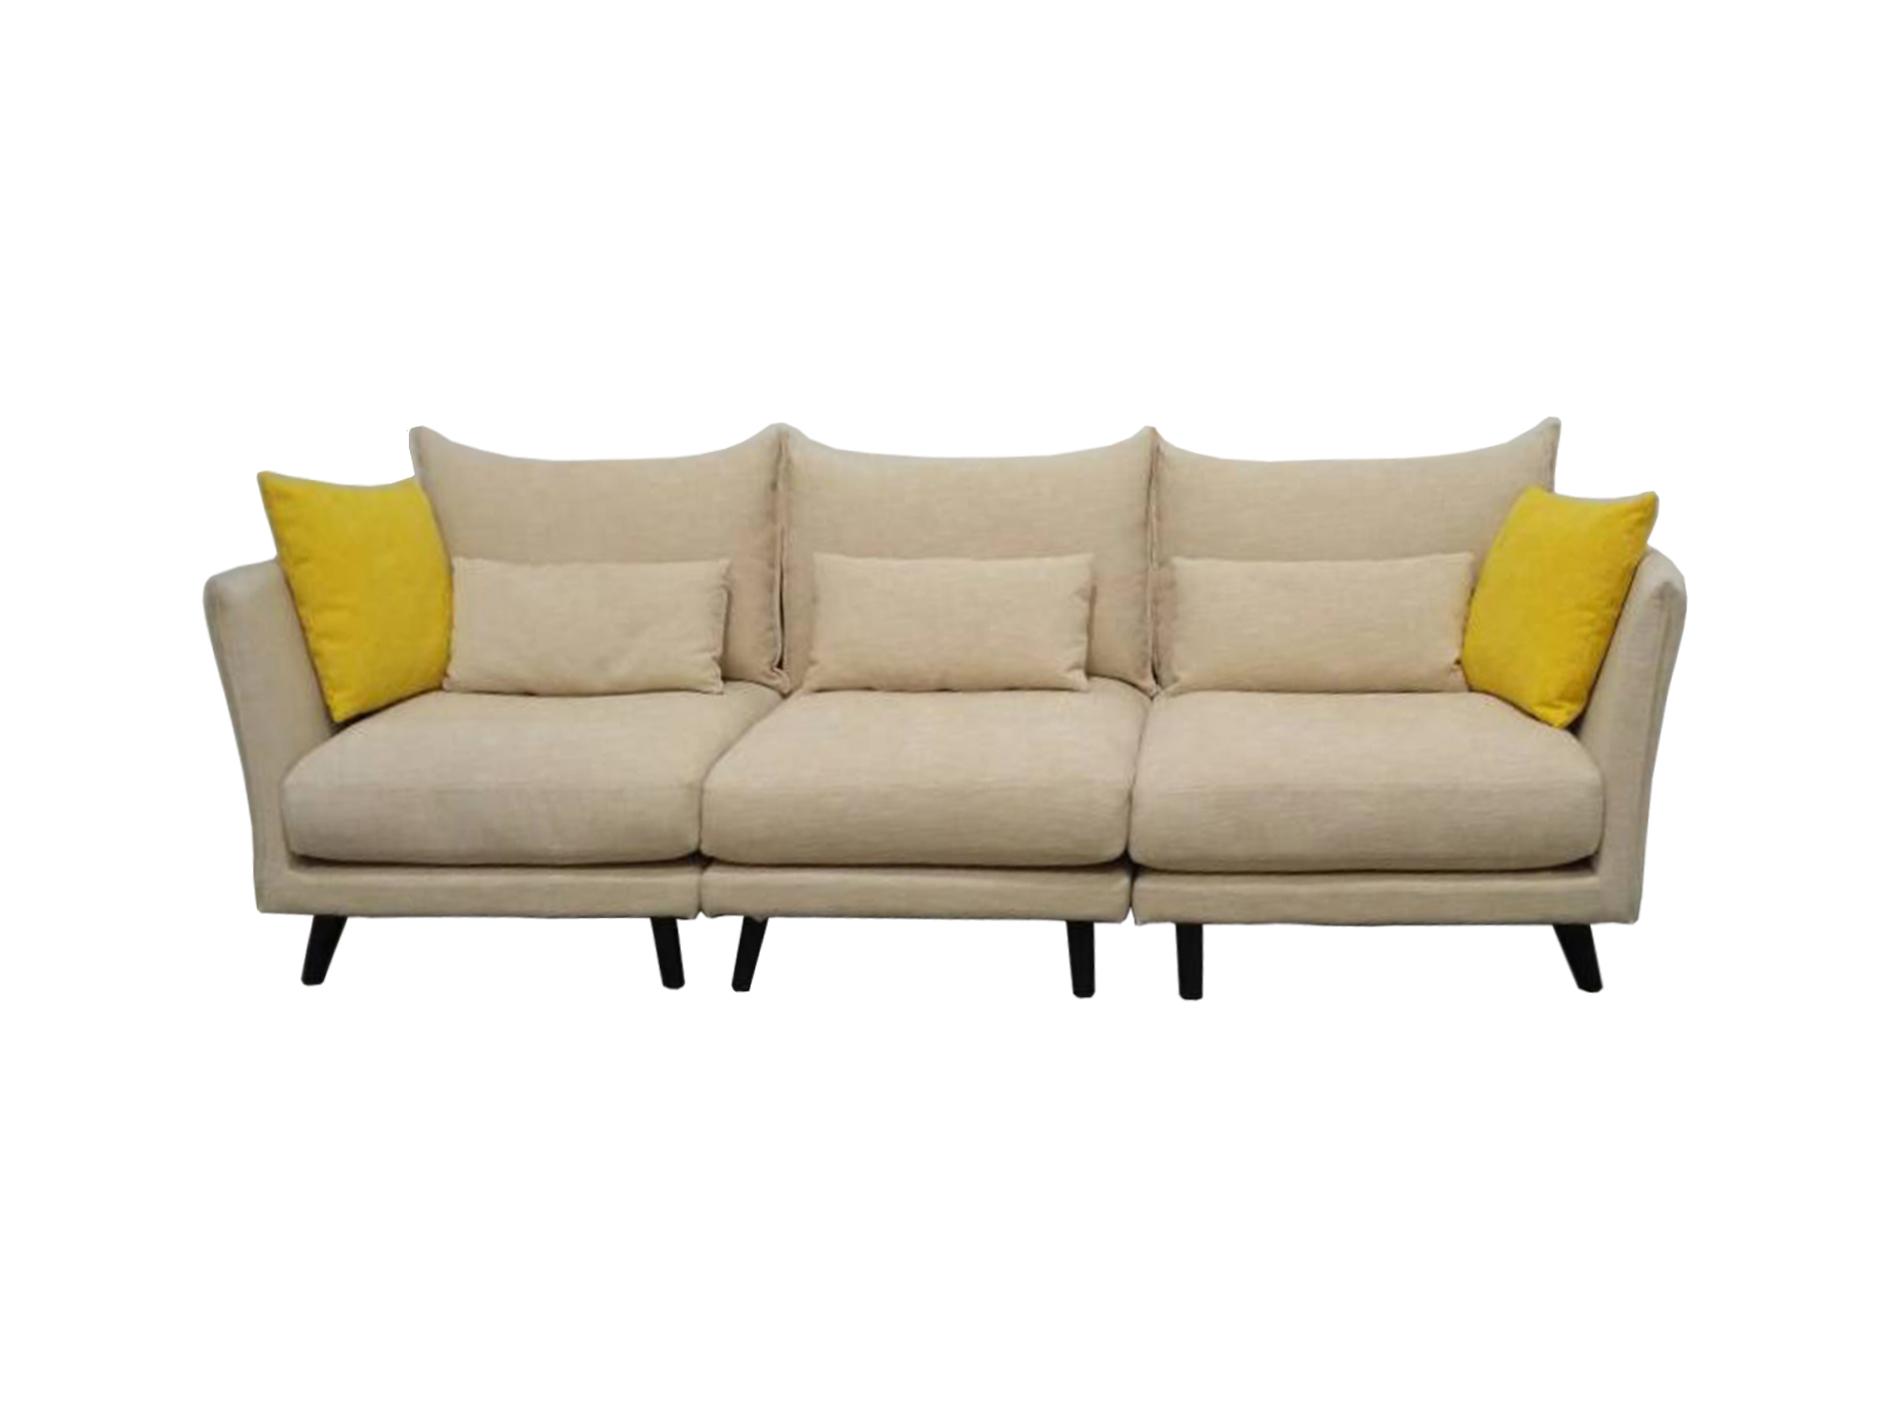 Valerio Designer Italian Fabric Sofa –  Giardino L/R/C Modular fabric sofa (94cm x 94cm)